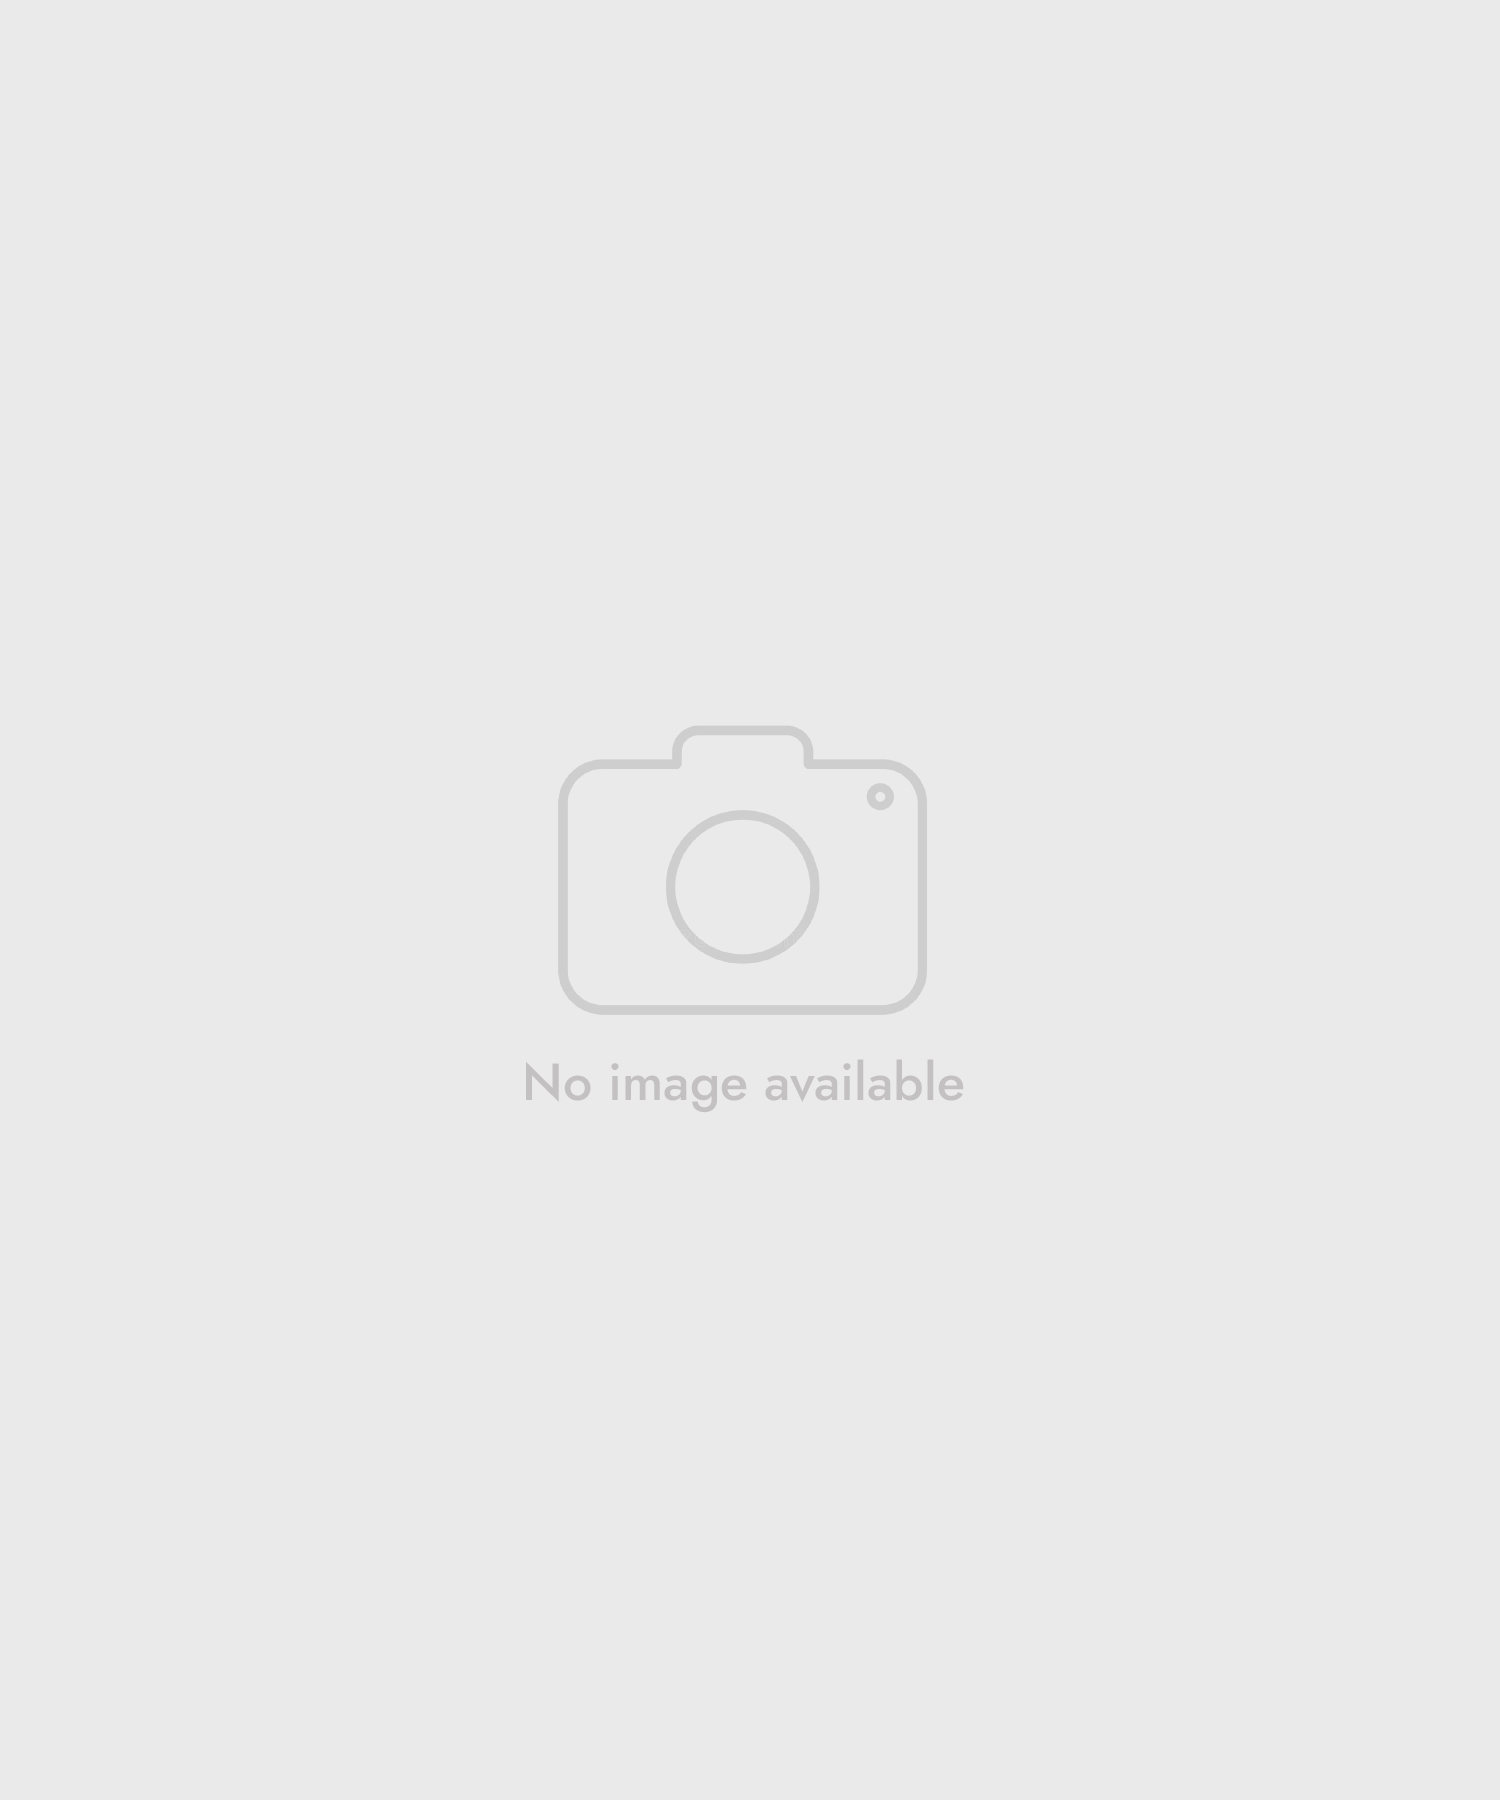 Szaro-czarna torebka damska